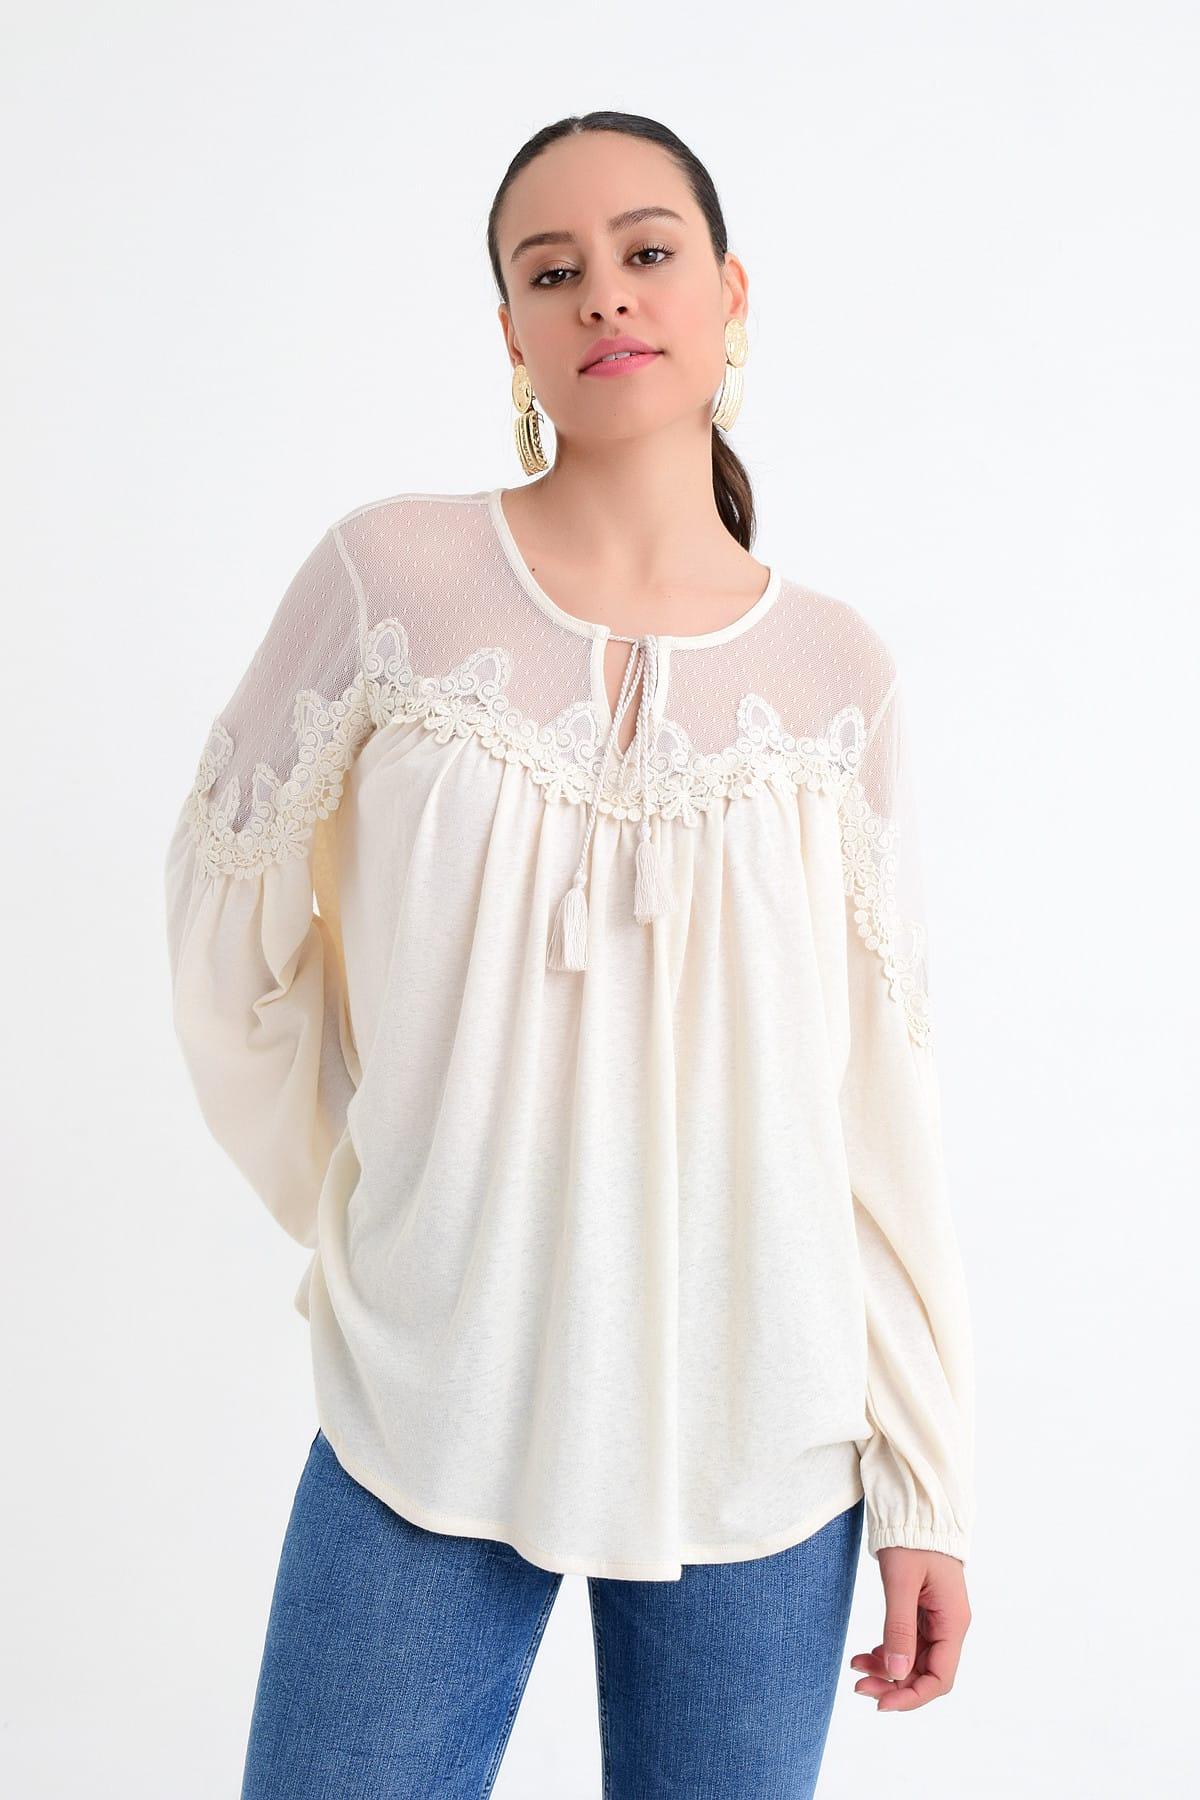 Hanna's by Hanna Darsa Kadın Beyaz Tül Detaylı Dantelli Uzun Kollu Bluz HN1746 1